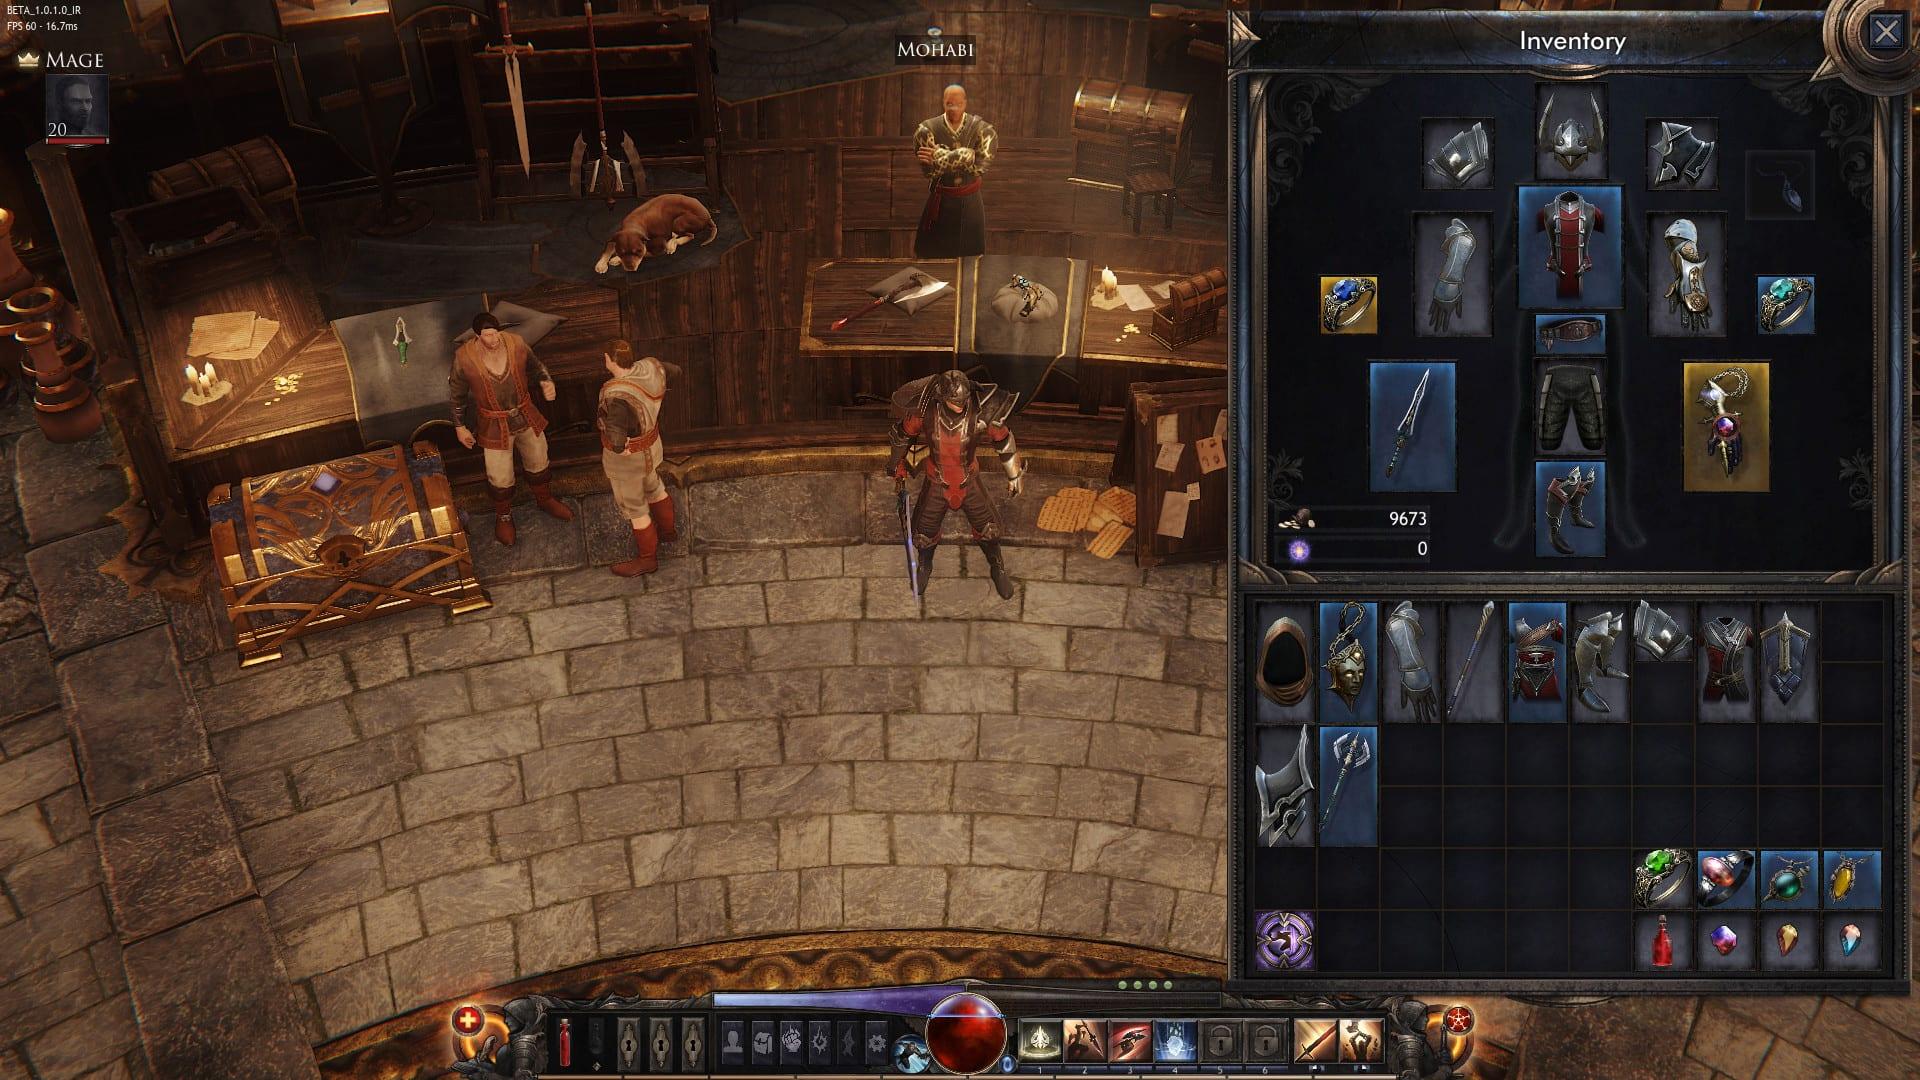 wolcen lords of mayhem, duplicates skills